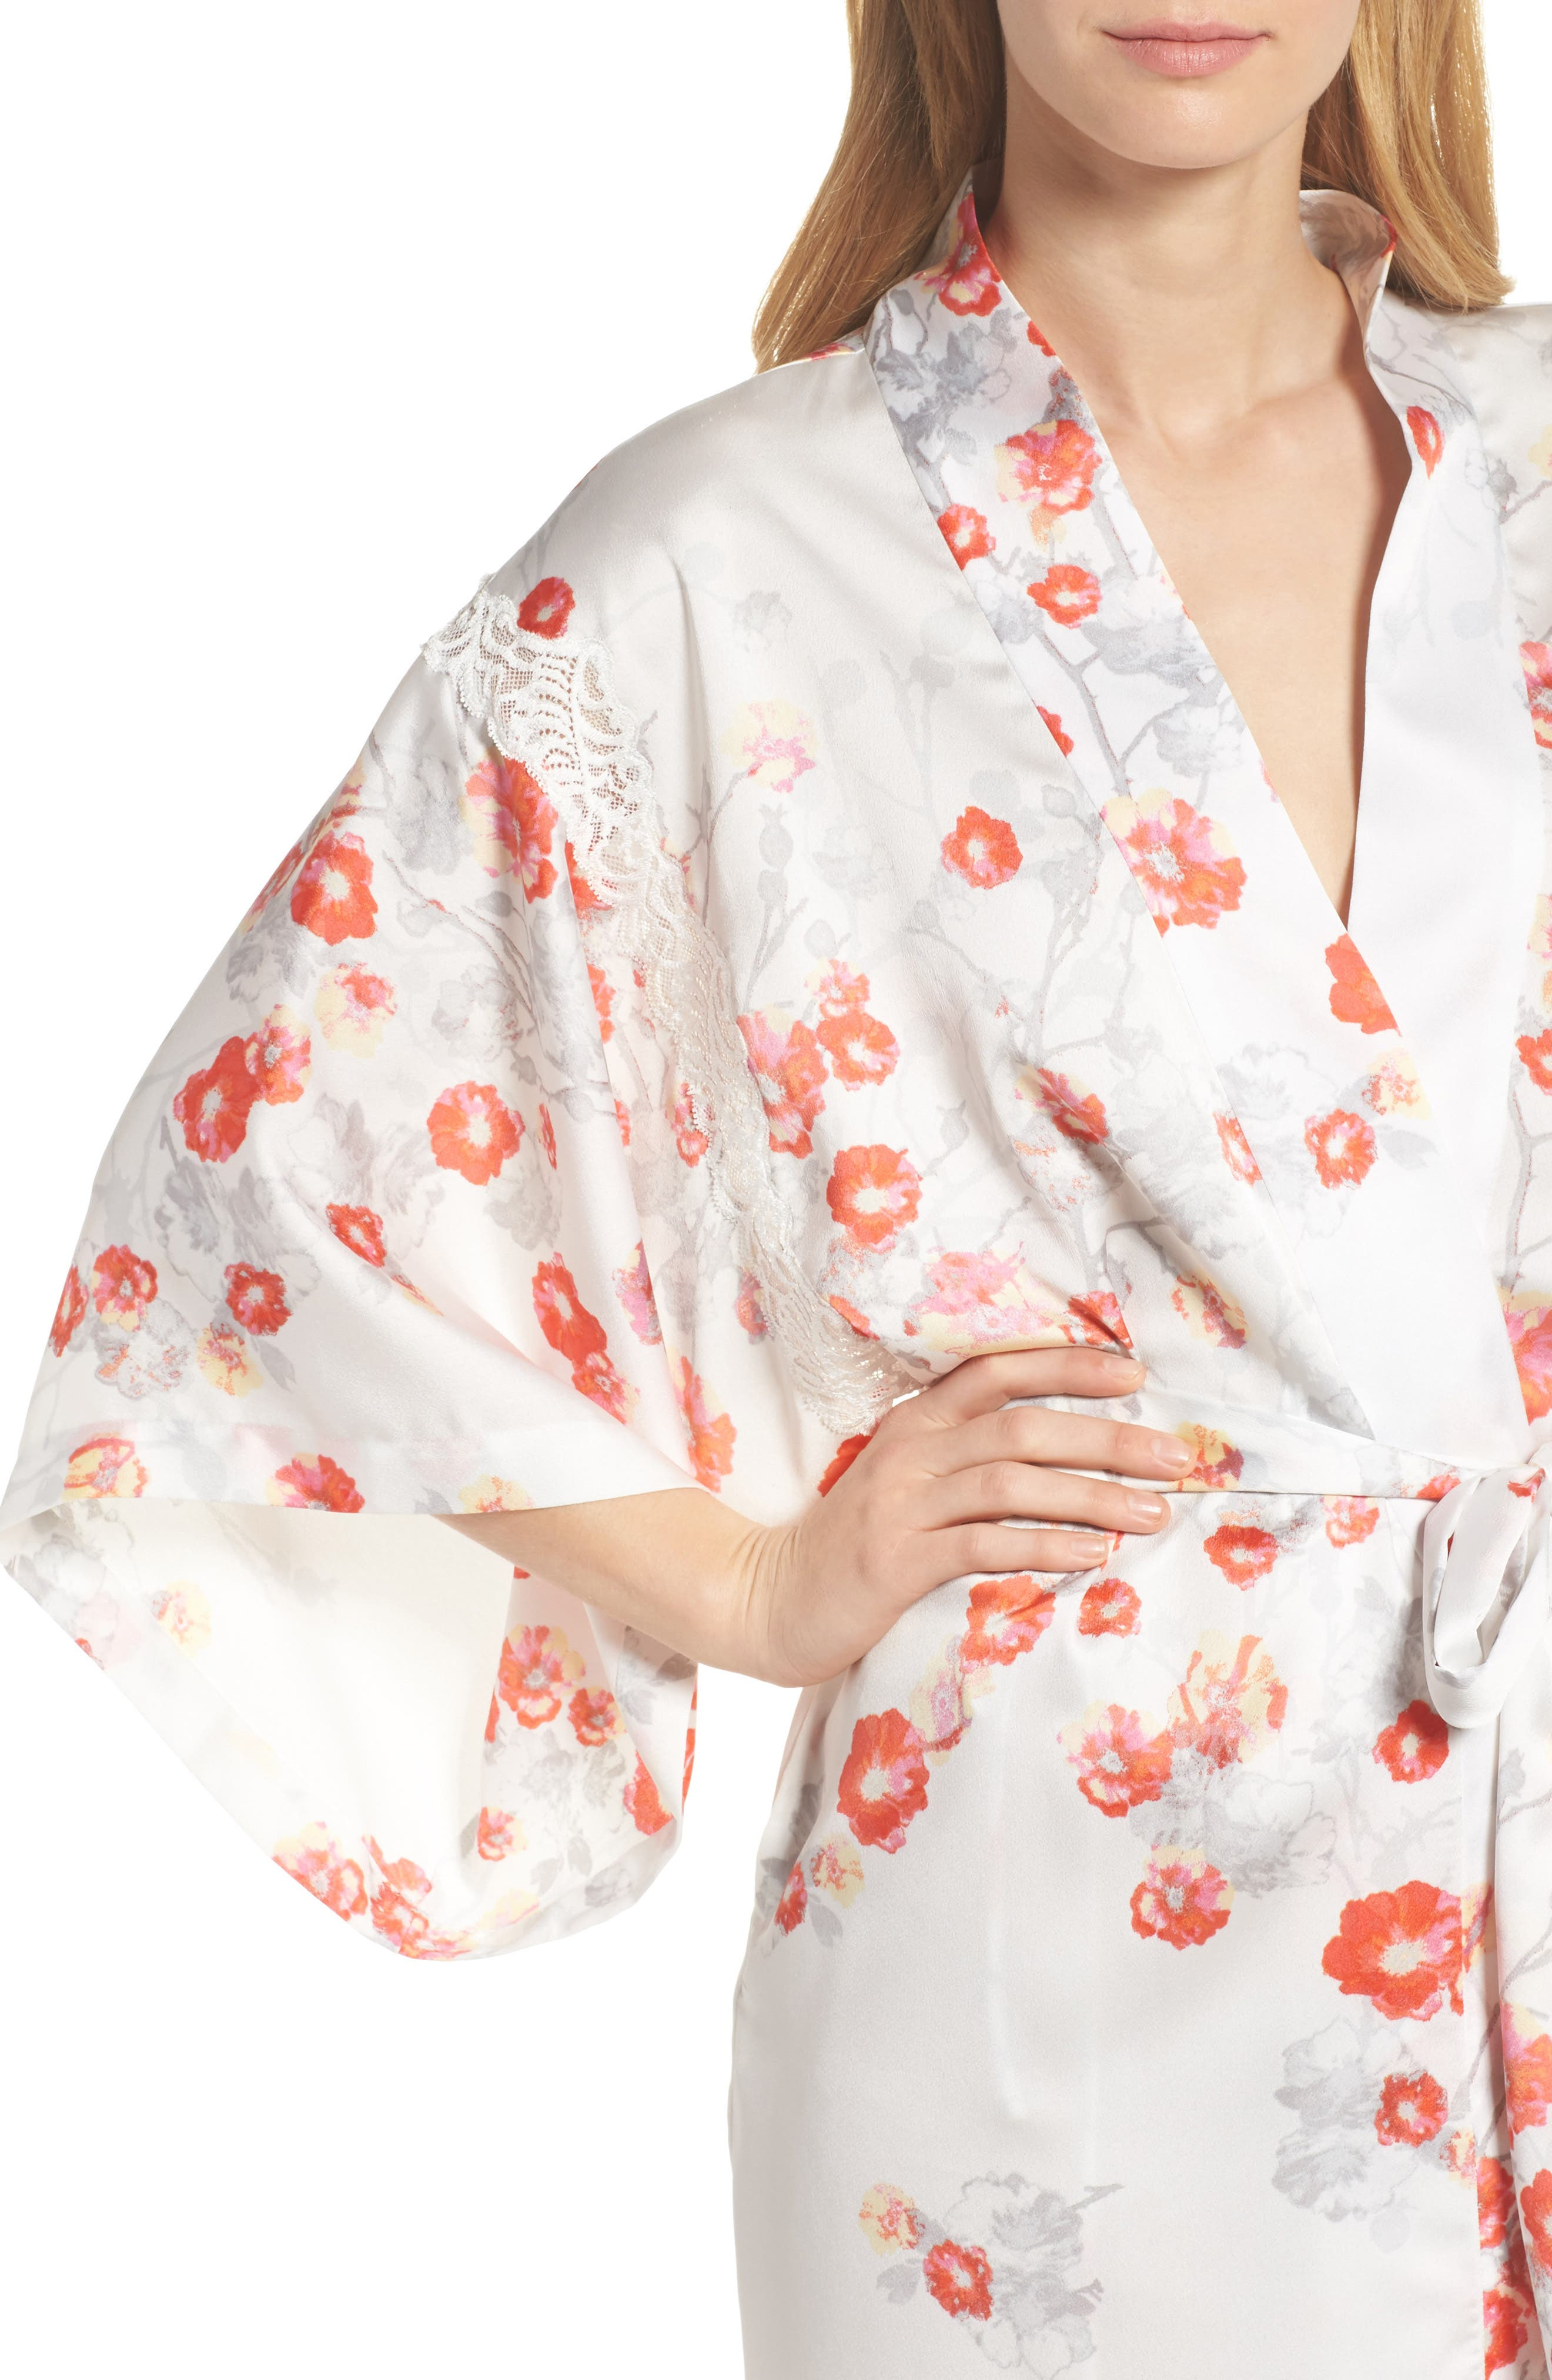 Blossom Print Wrap,                             Alternate thumbnail 4, color,                             White/ Multi